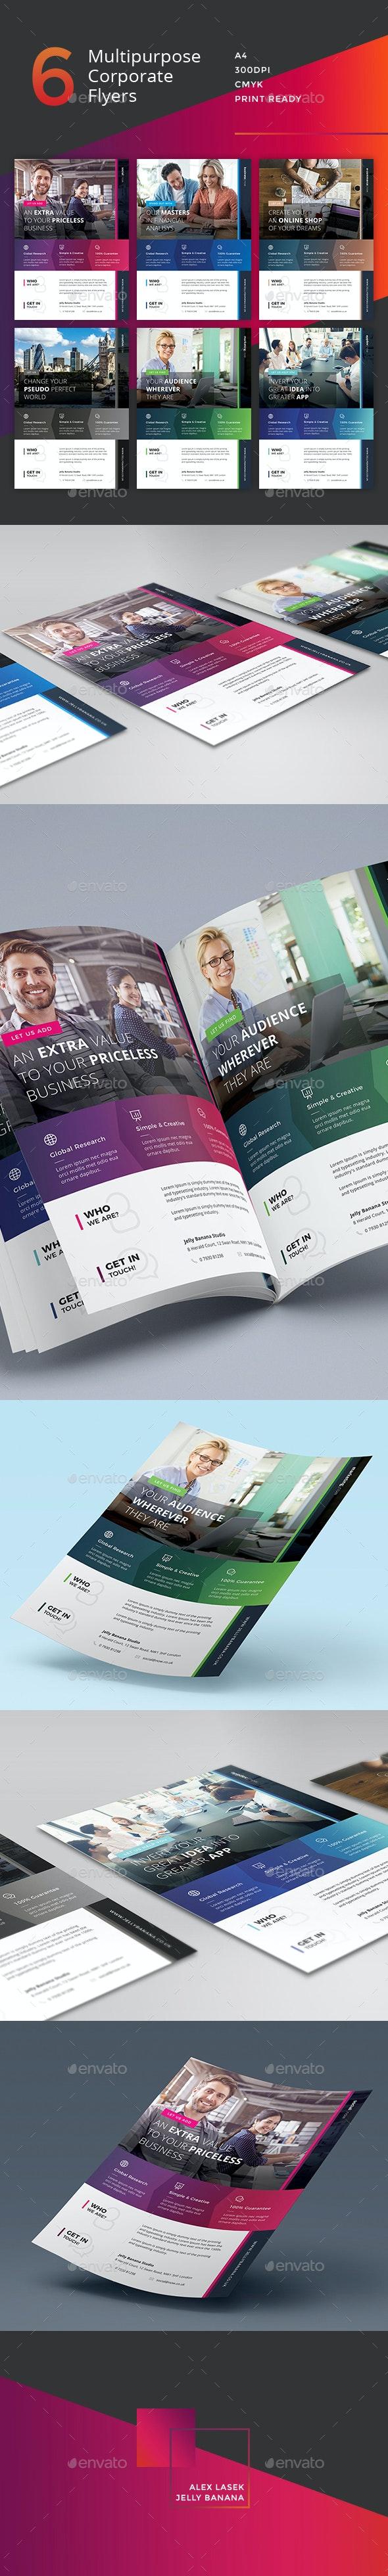 Corporate Flyer - 6 Multipurpose Business Templates vol 28 - Corporate Flyers